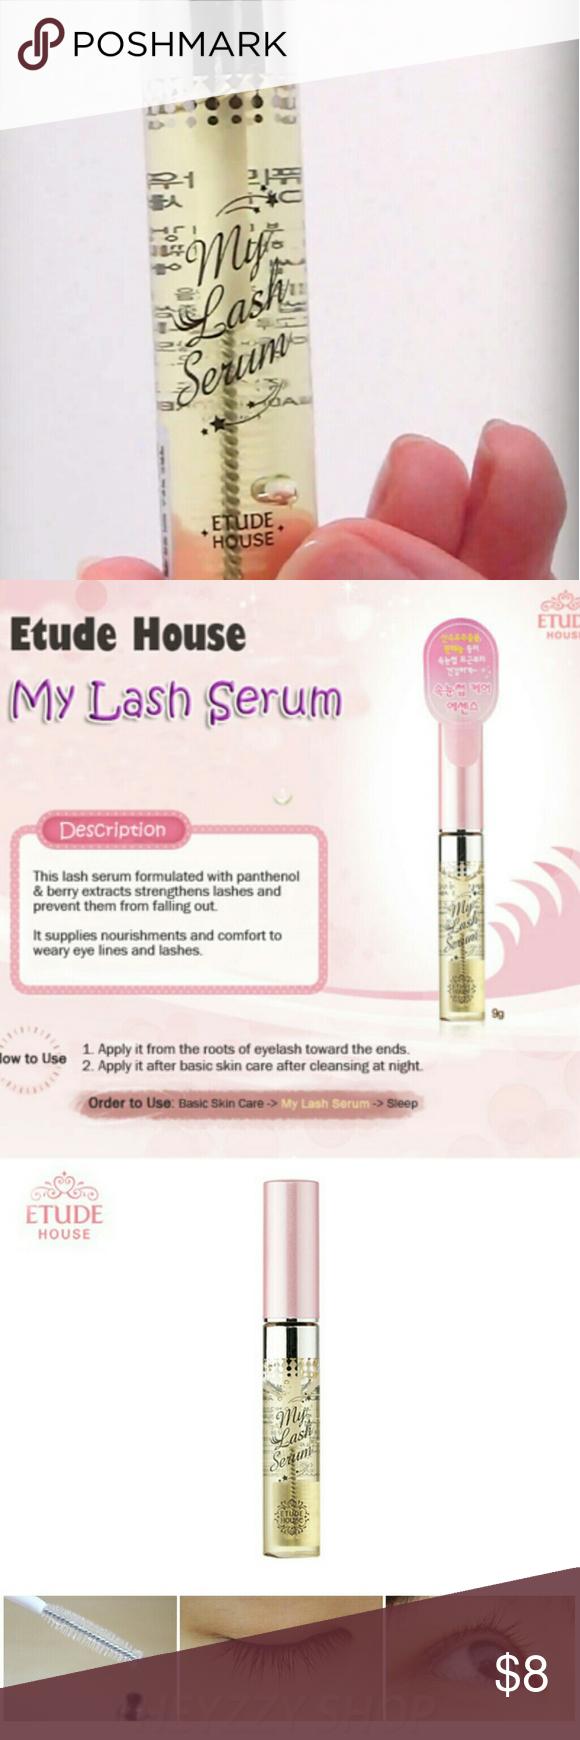 80798fb20c6 Etude House Lash Serum 9g Lash Growth Selling Etude House Lash Serum; a  Korean cosmetic